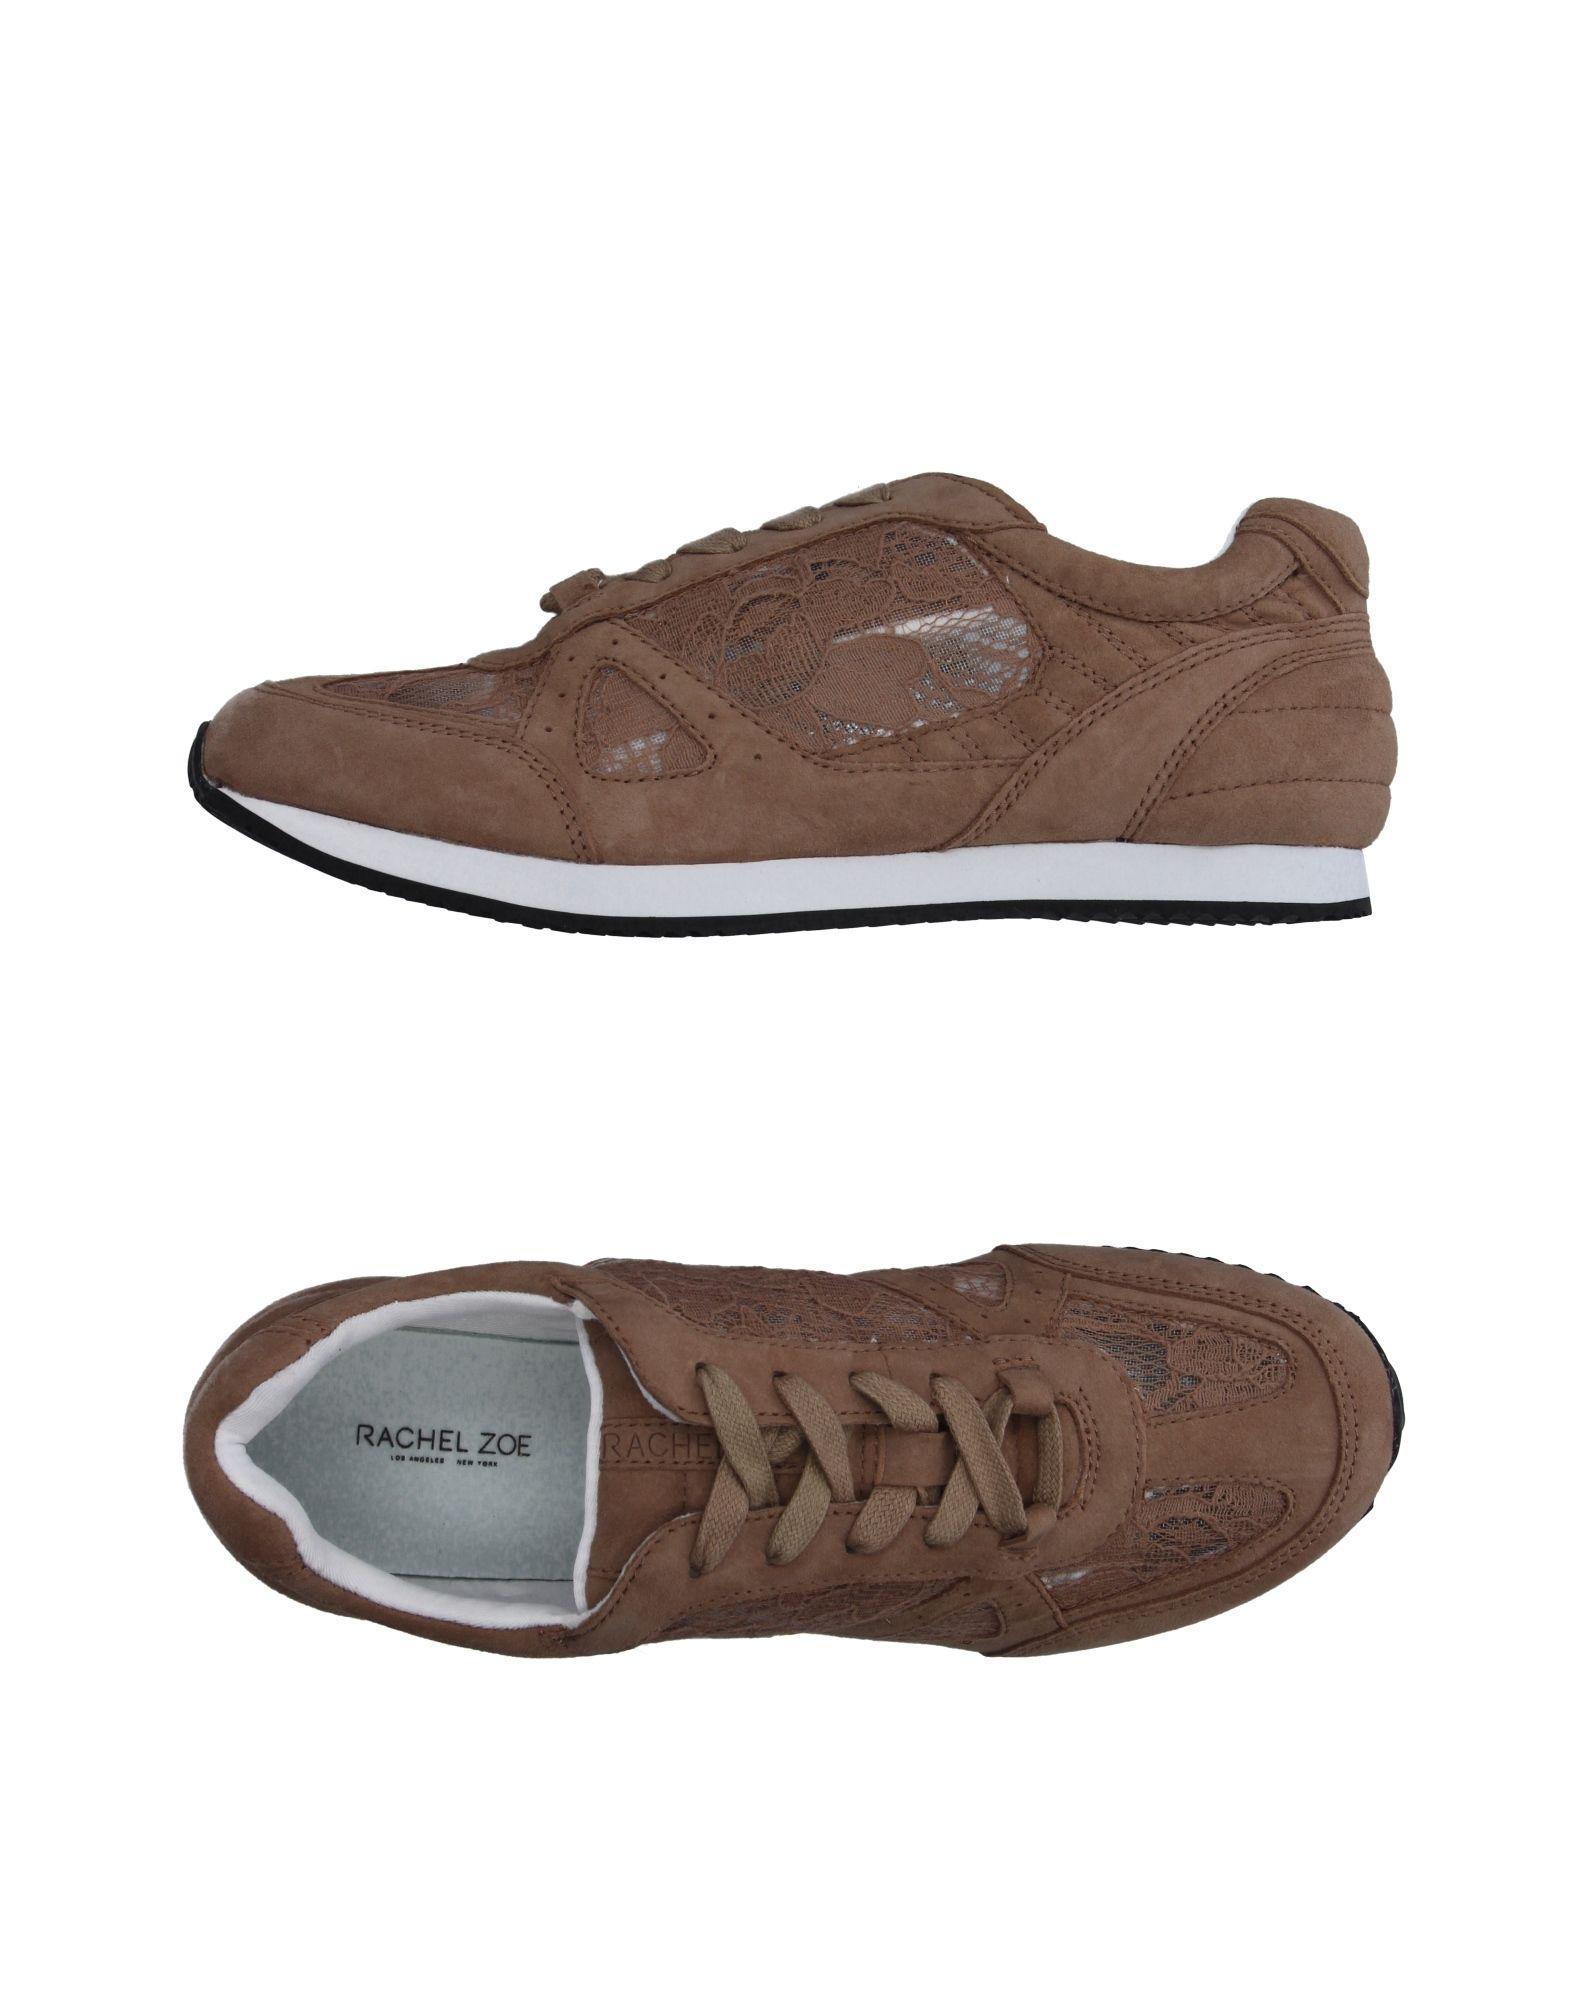 FOOTWEAR - Low-tops & sneakers Rachel Zoe 5wNYwm0c